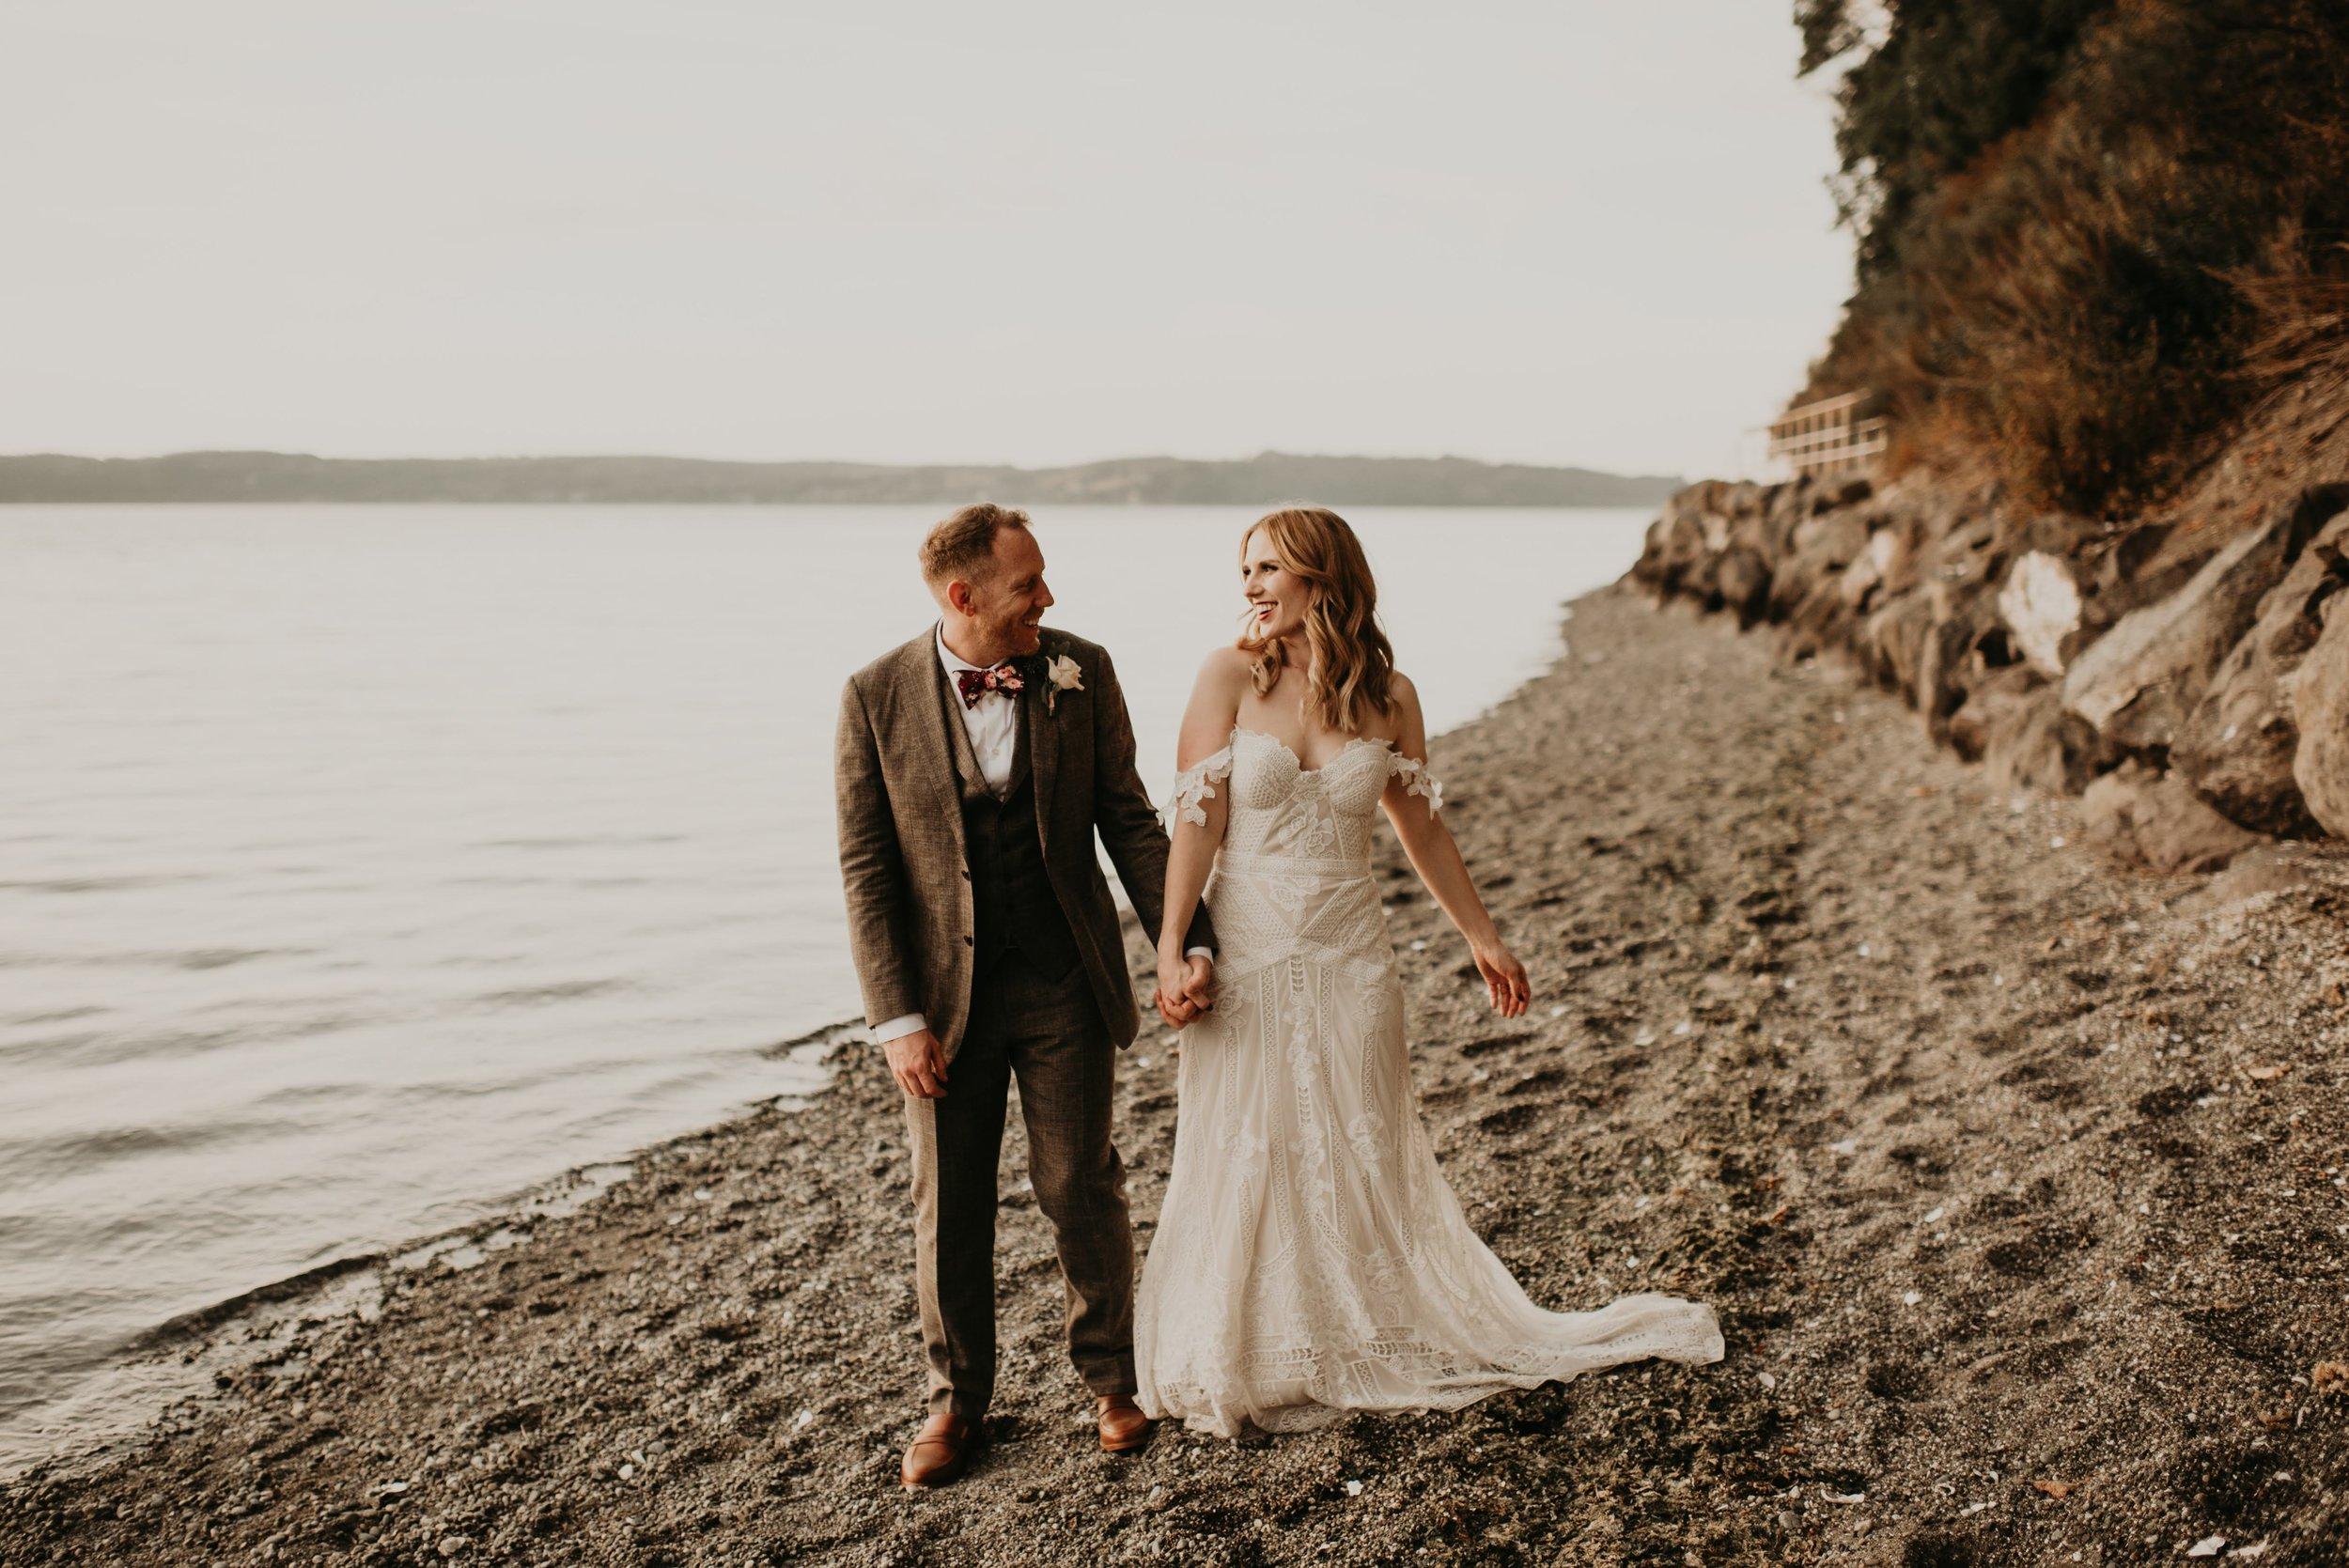 Ashley + Peter Wedding - Kitsap Memorial State Park - Kamra Fuller Photography-1029.jpg